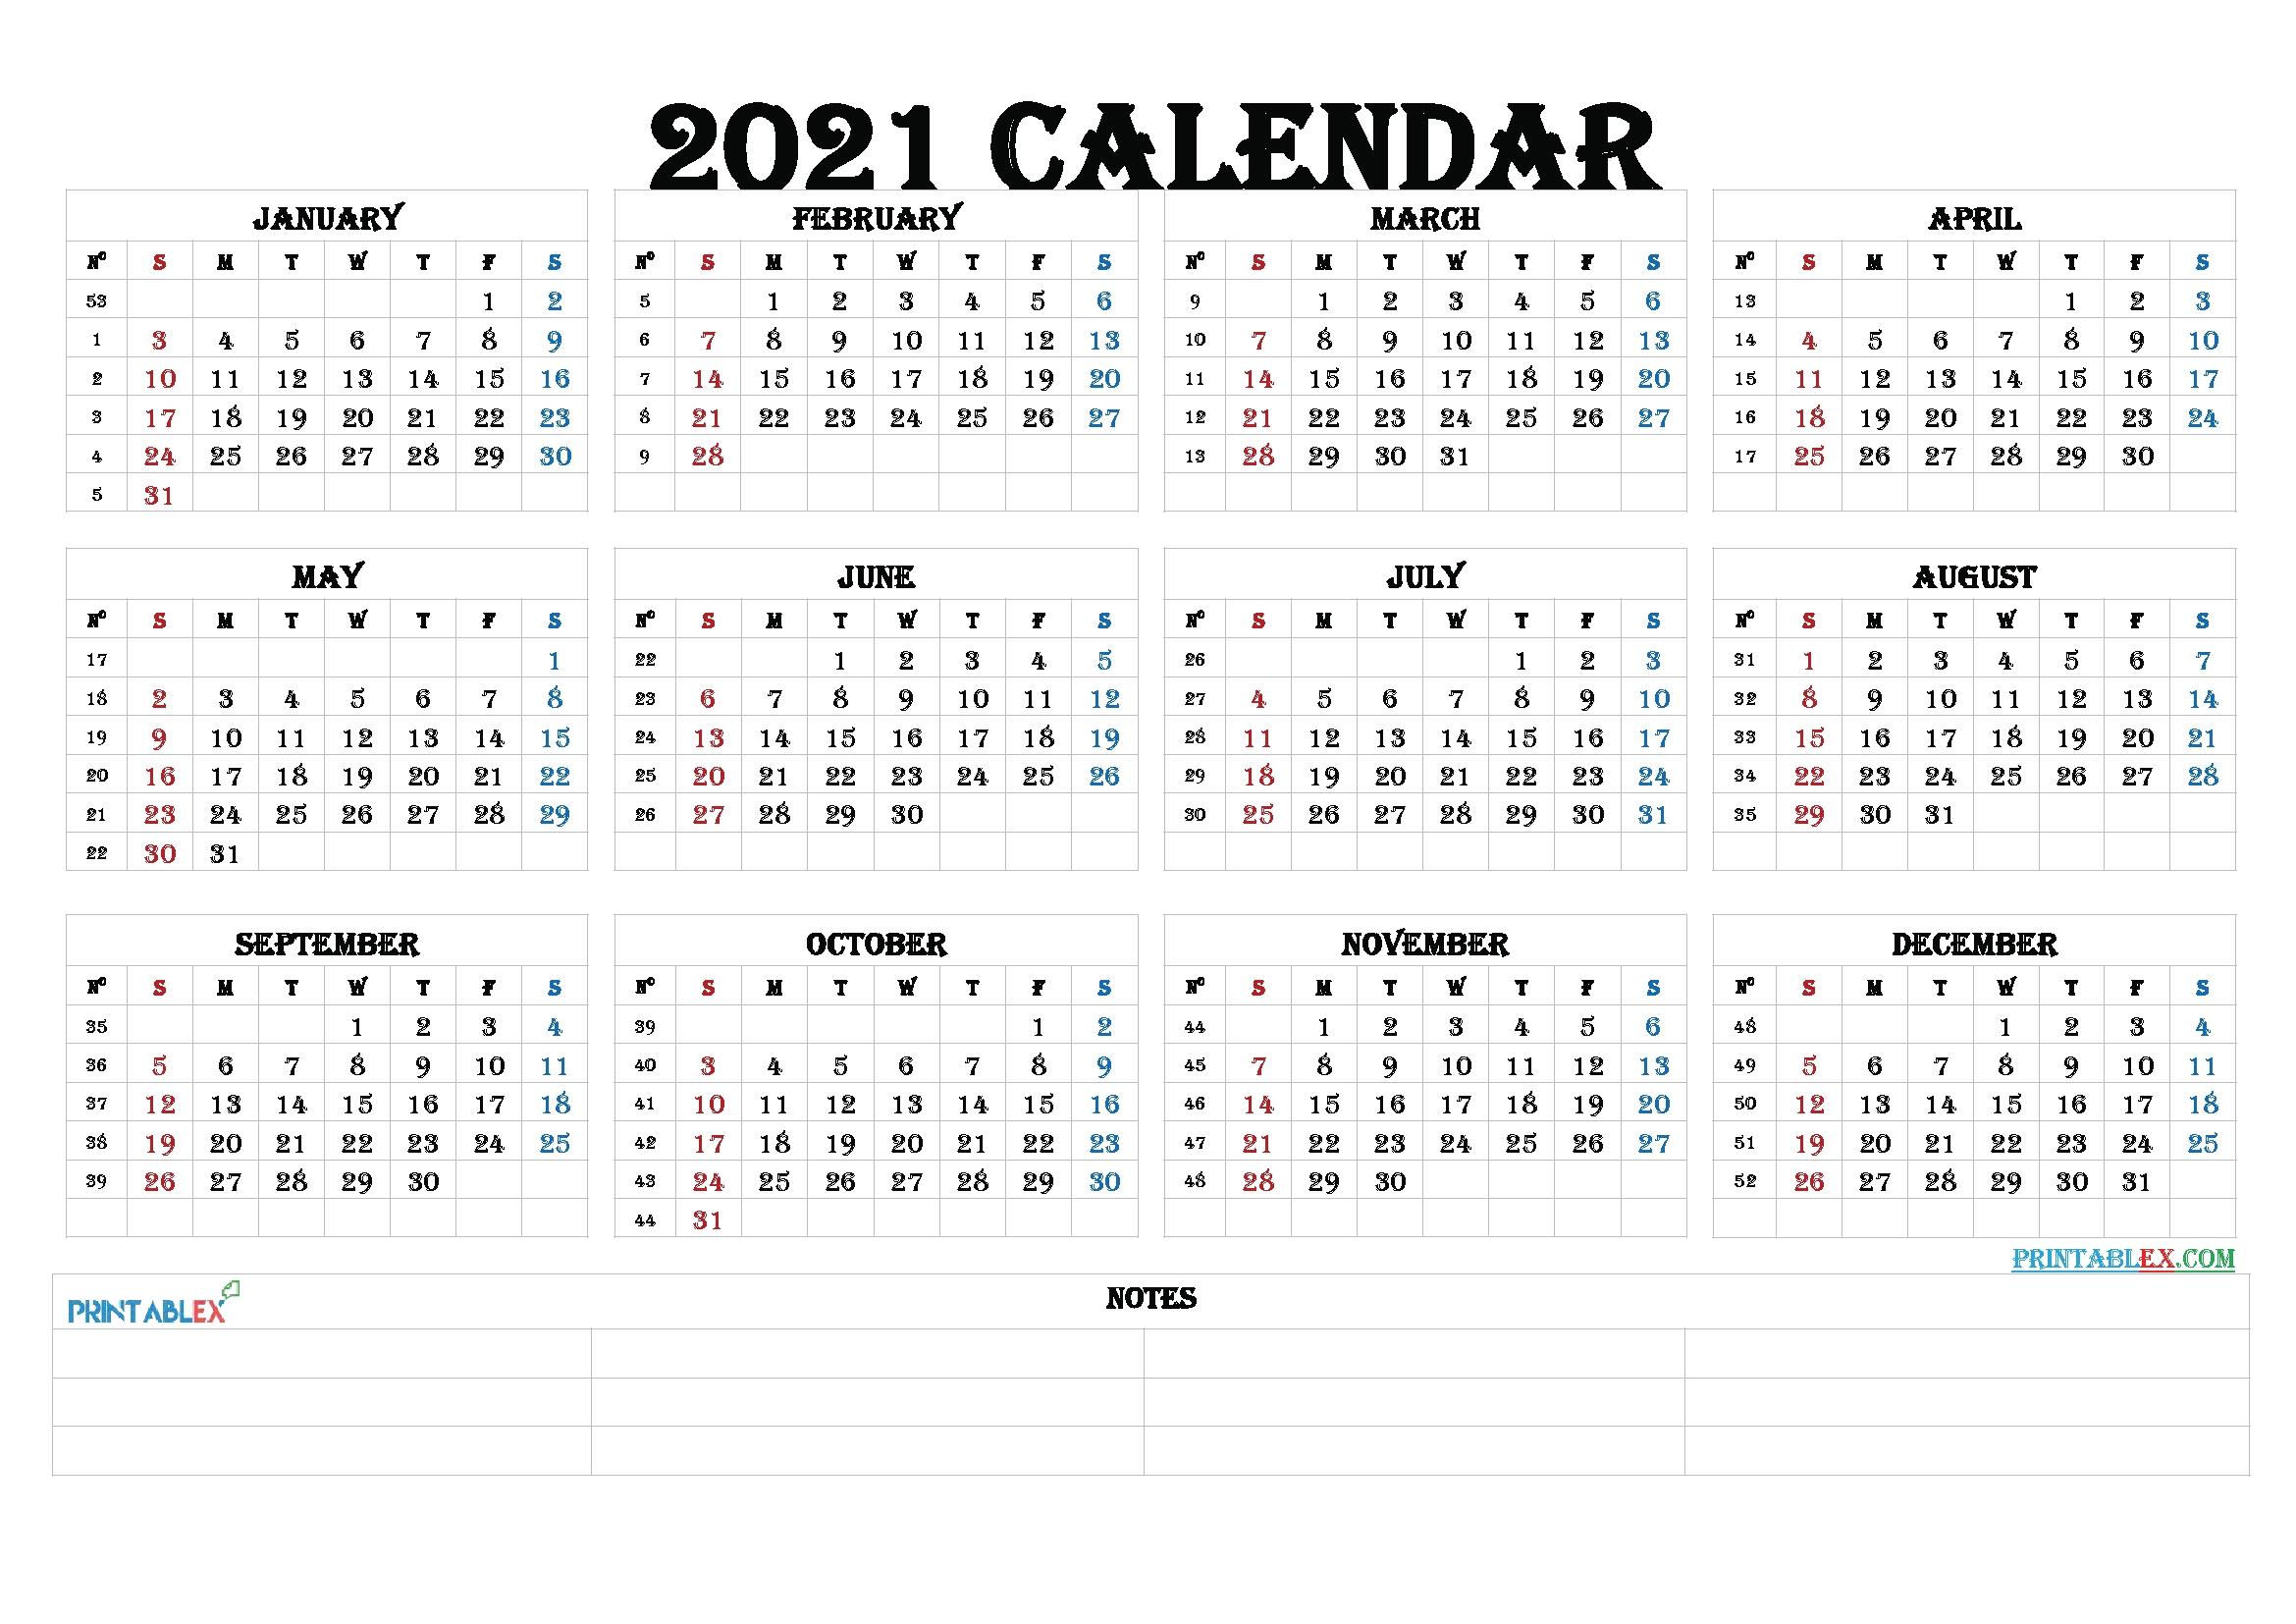 2021 Calendar With Week Numbers Printable regarding 2021 Australian Calendars To Print Photo